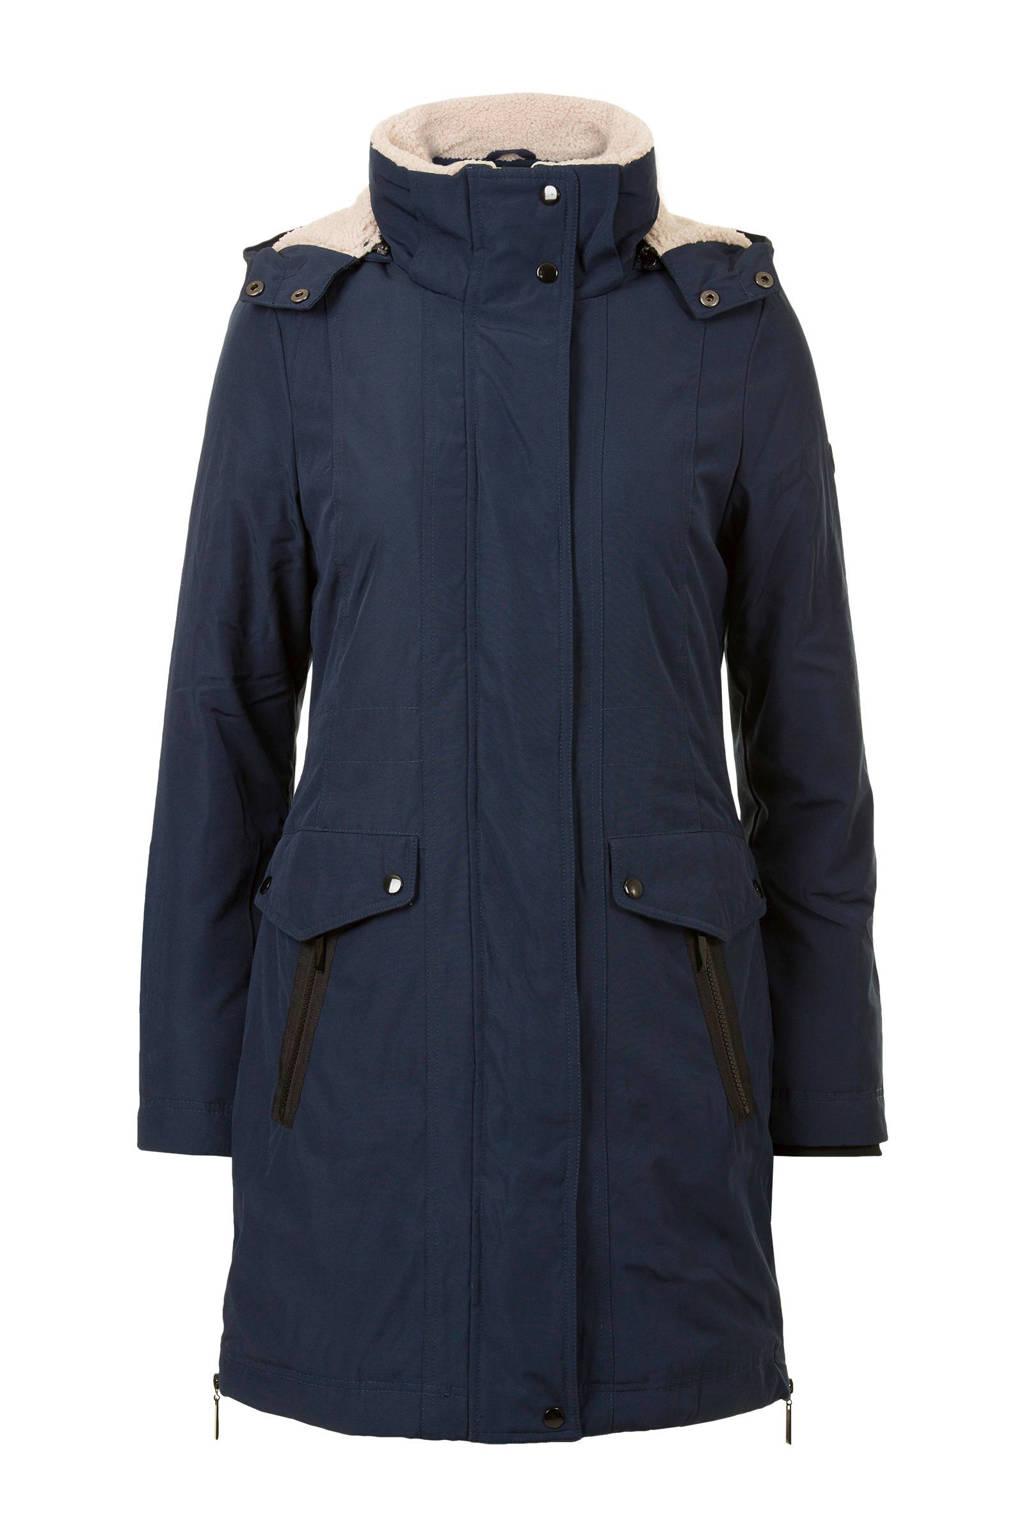 Miss Etam Regulier winterjas donkerblauw, Donkerblauw